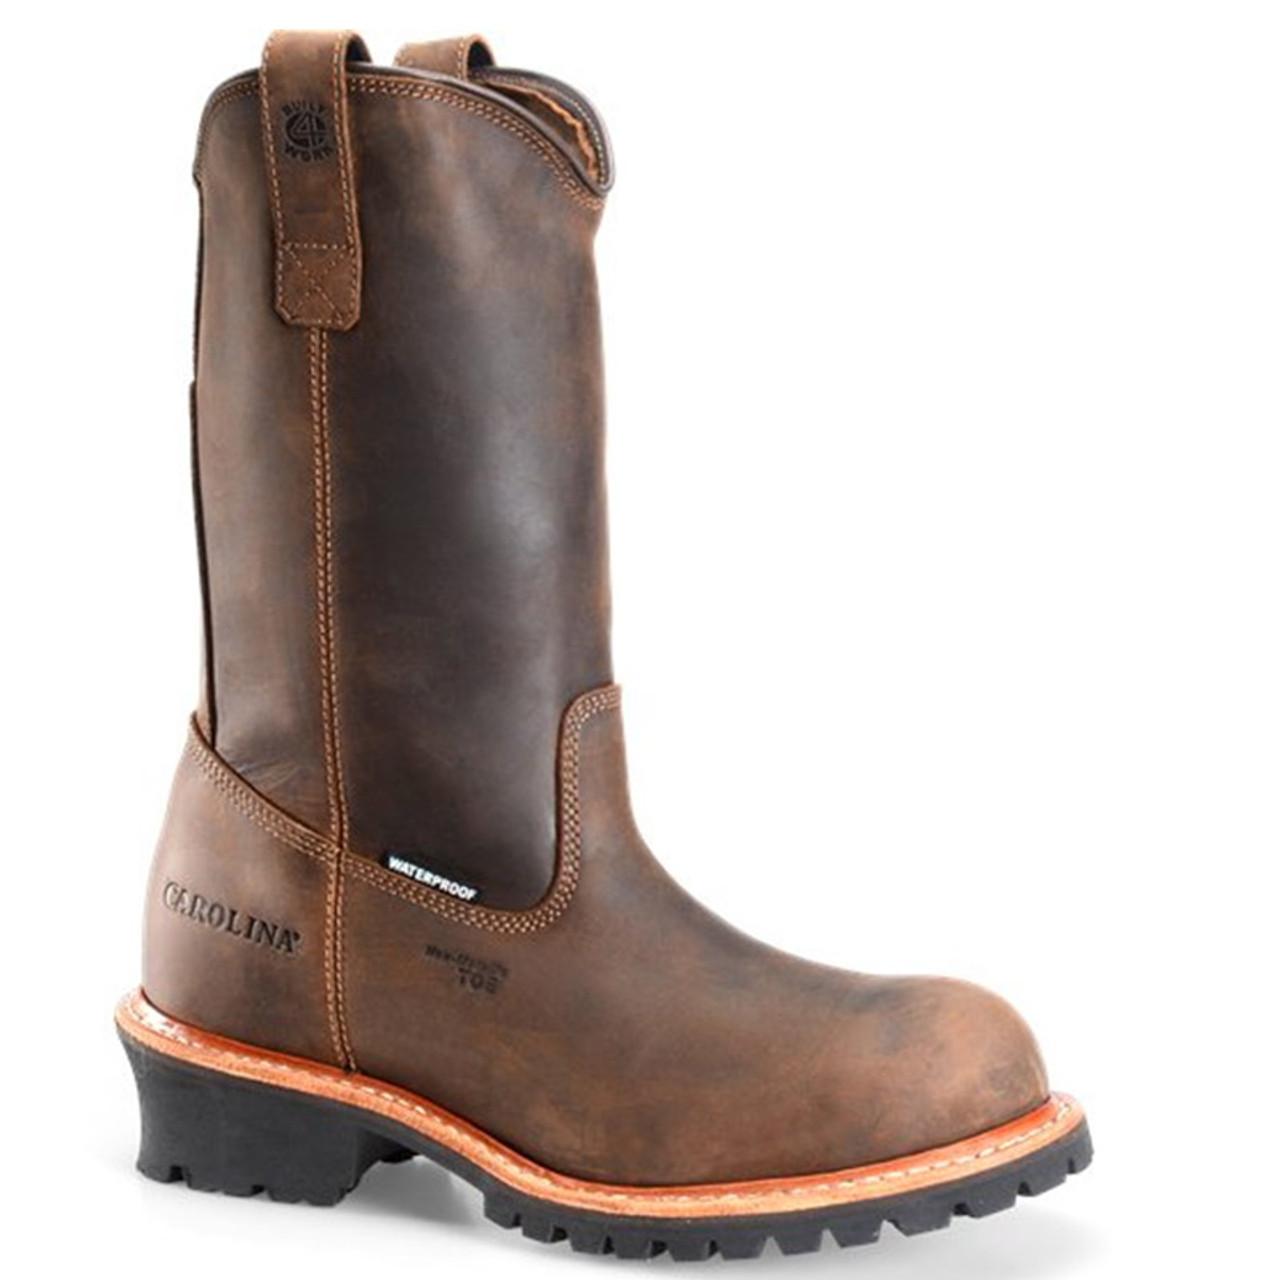 581beea0c9d Carolina CA9831 WELL X Composite Toe Wellington Non-Insulated Loggers